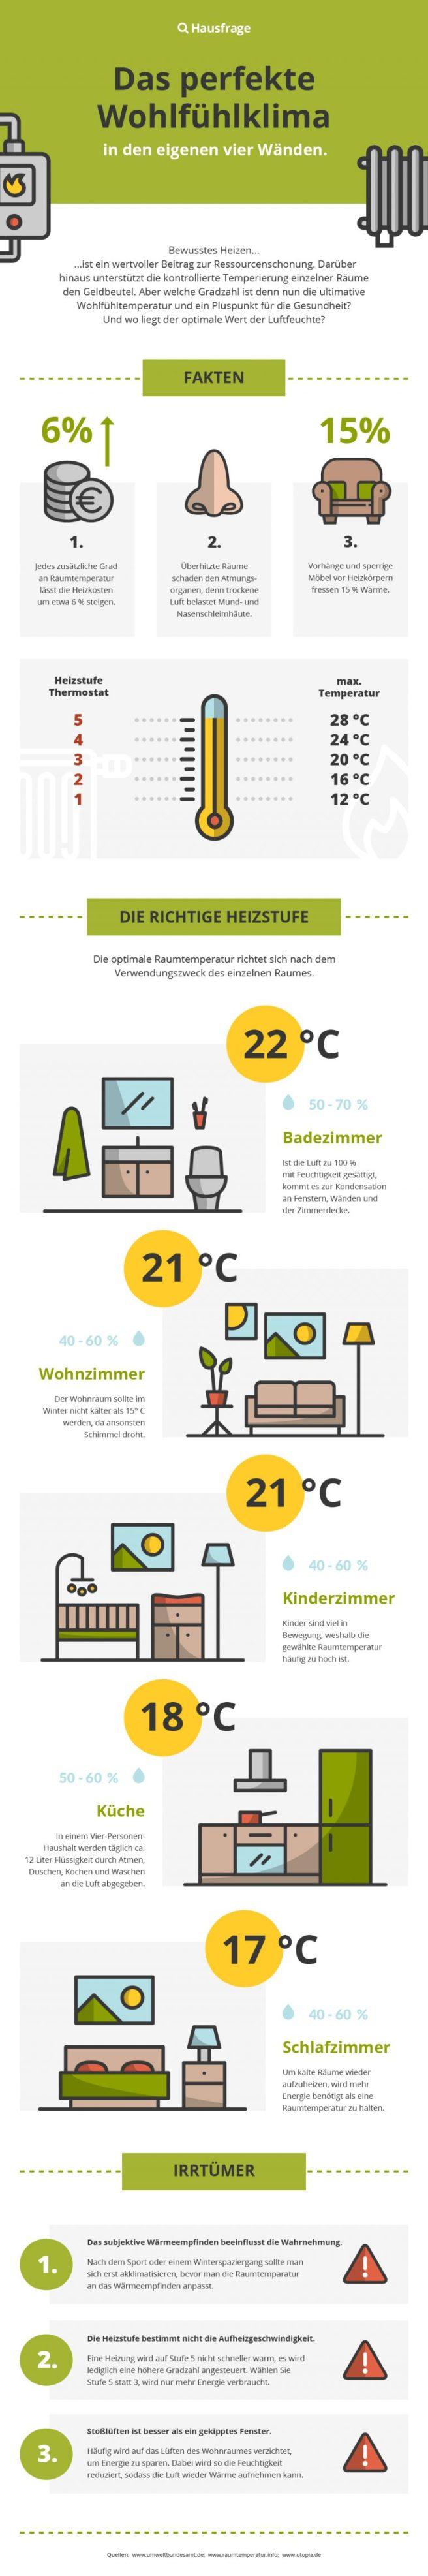 Infografik_Wohlfühlklima_Hausfrage-768x4622